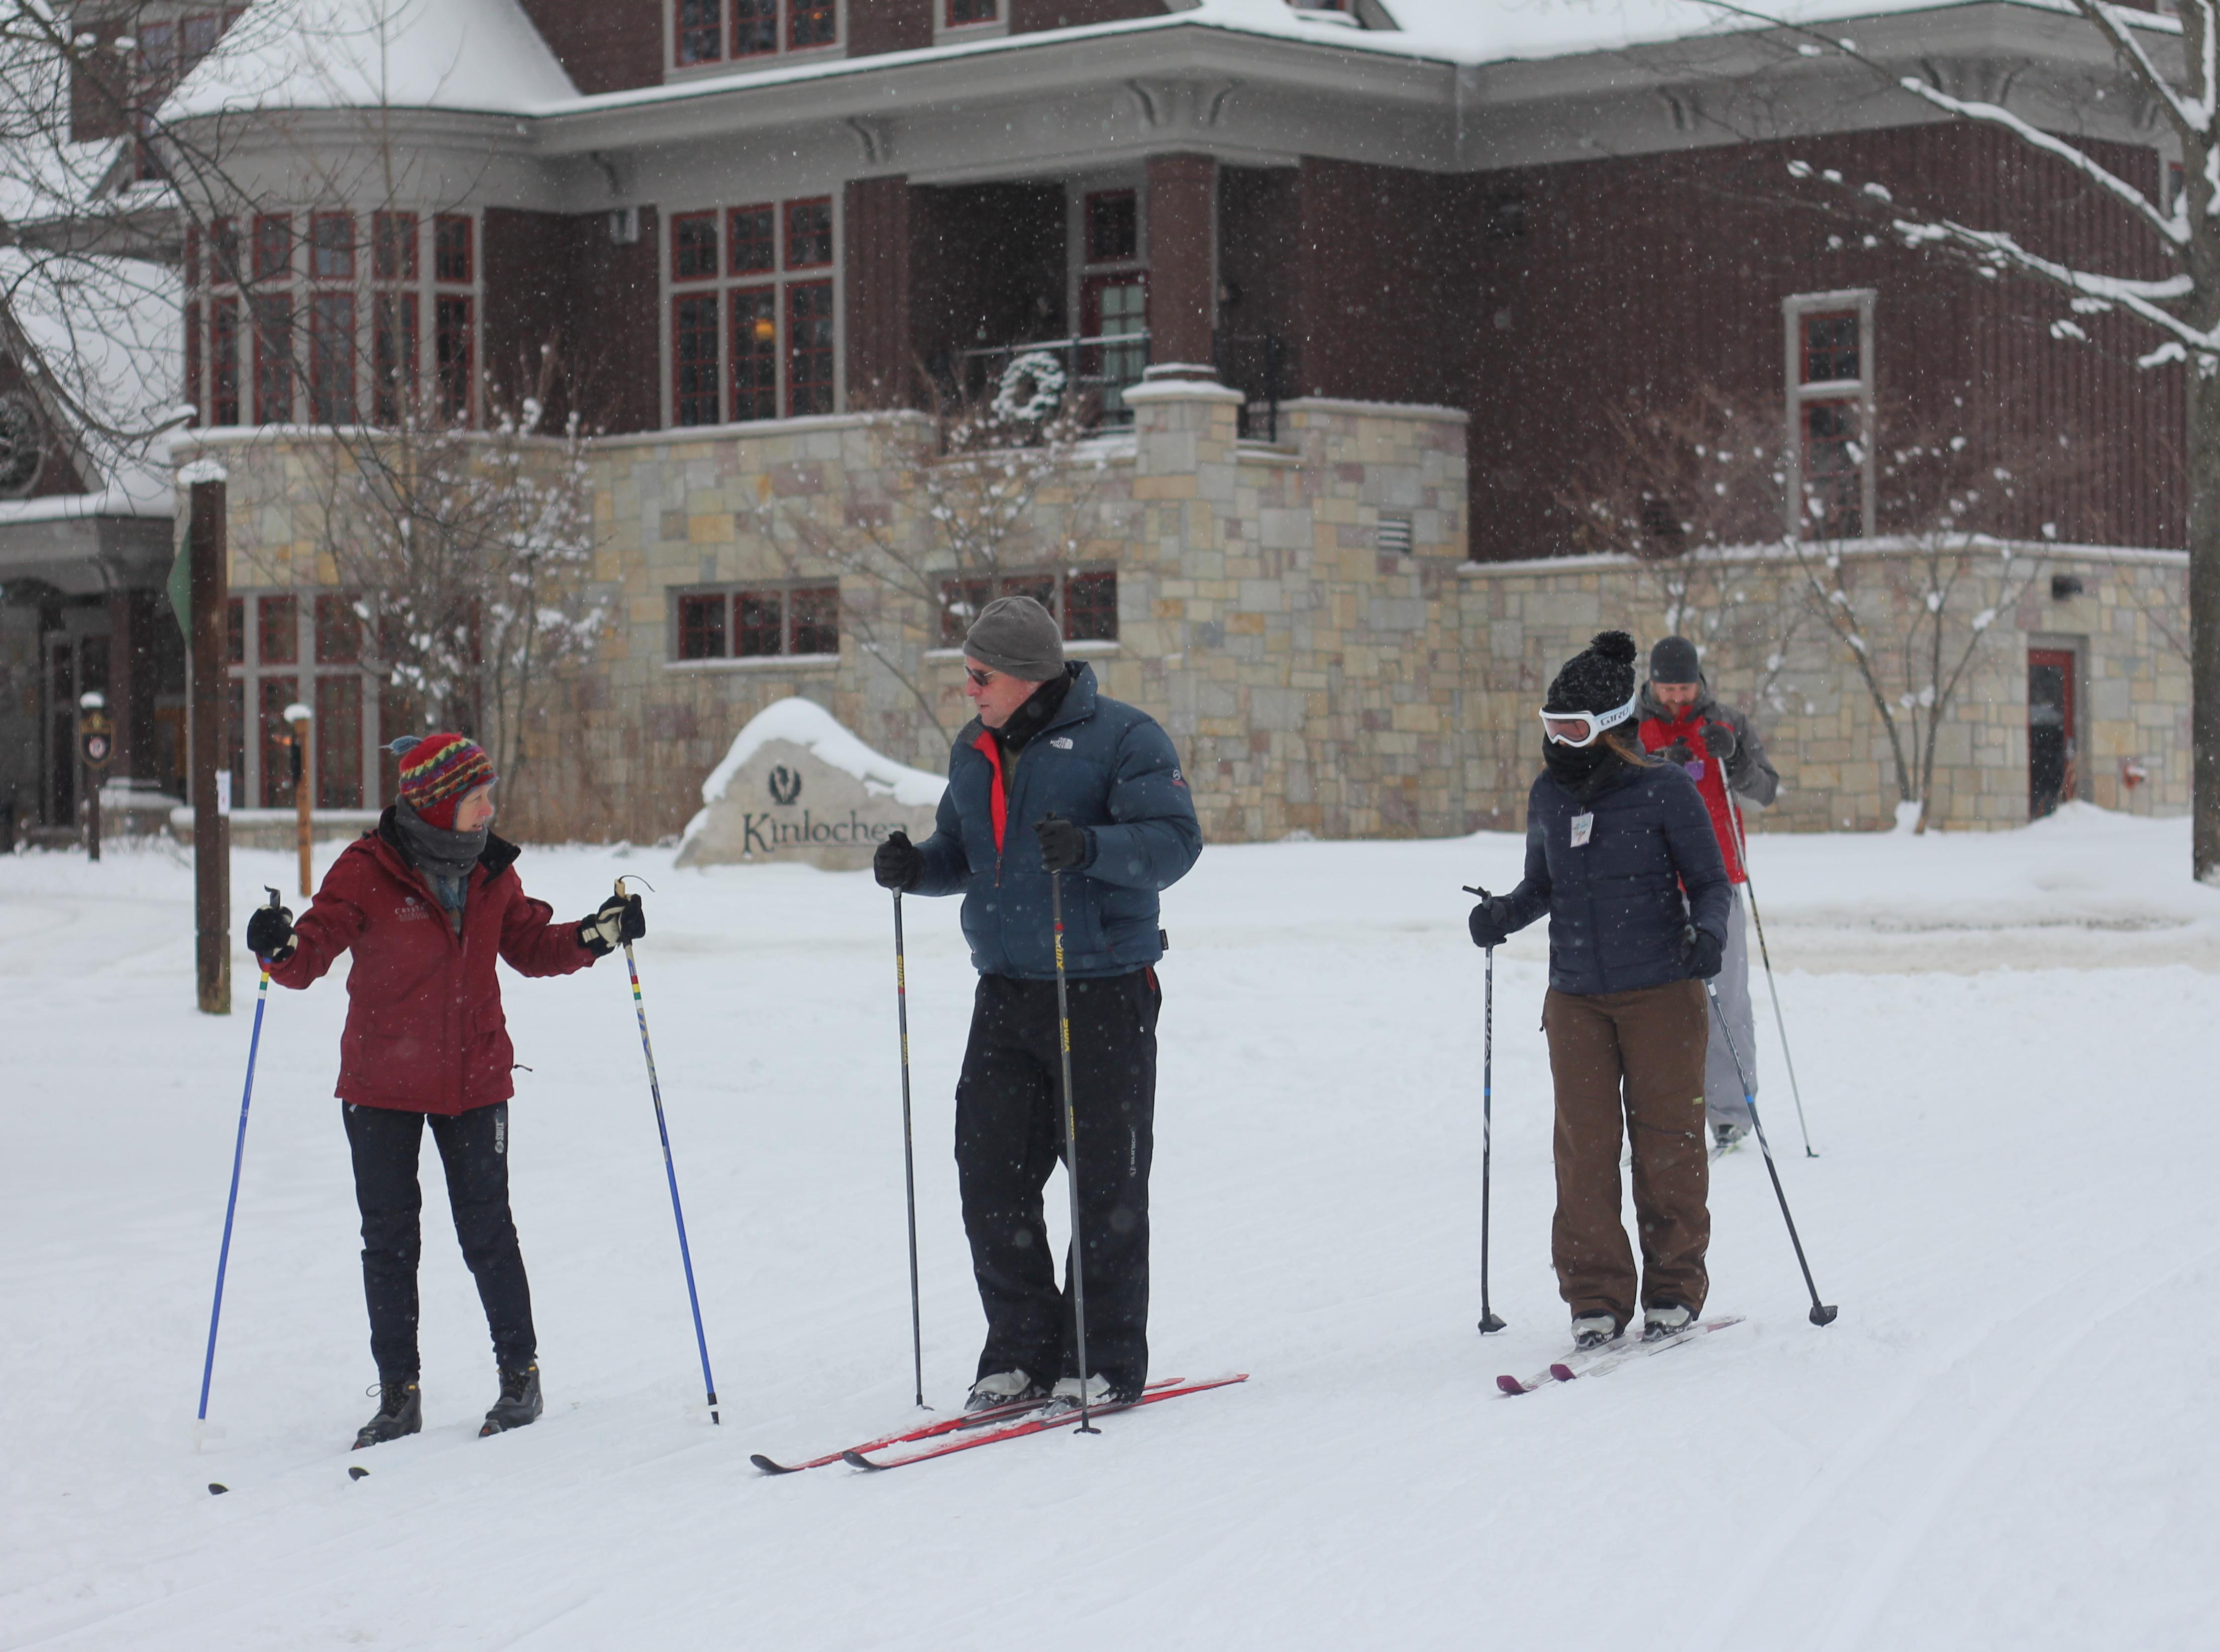 crystal XC Trails Day at Otter Run trailhead